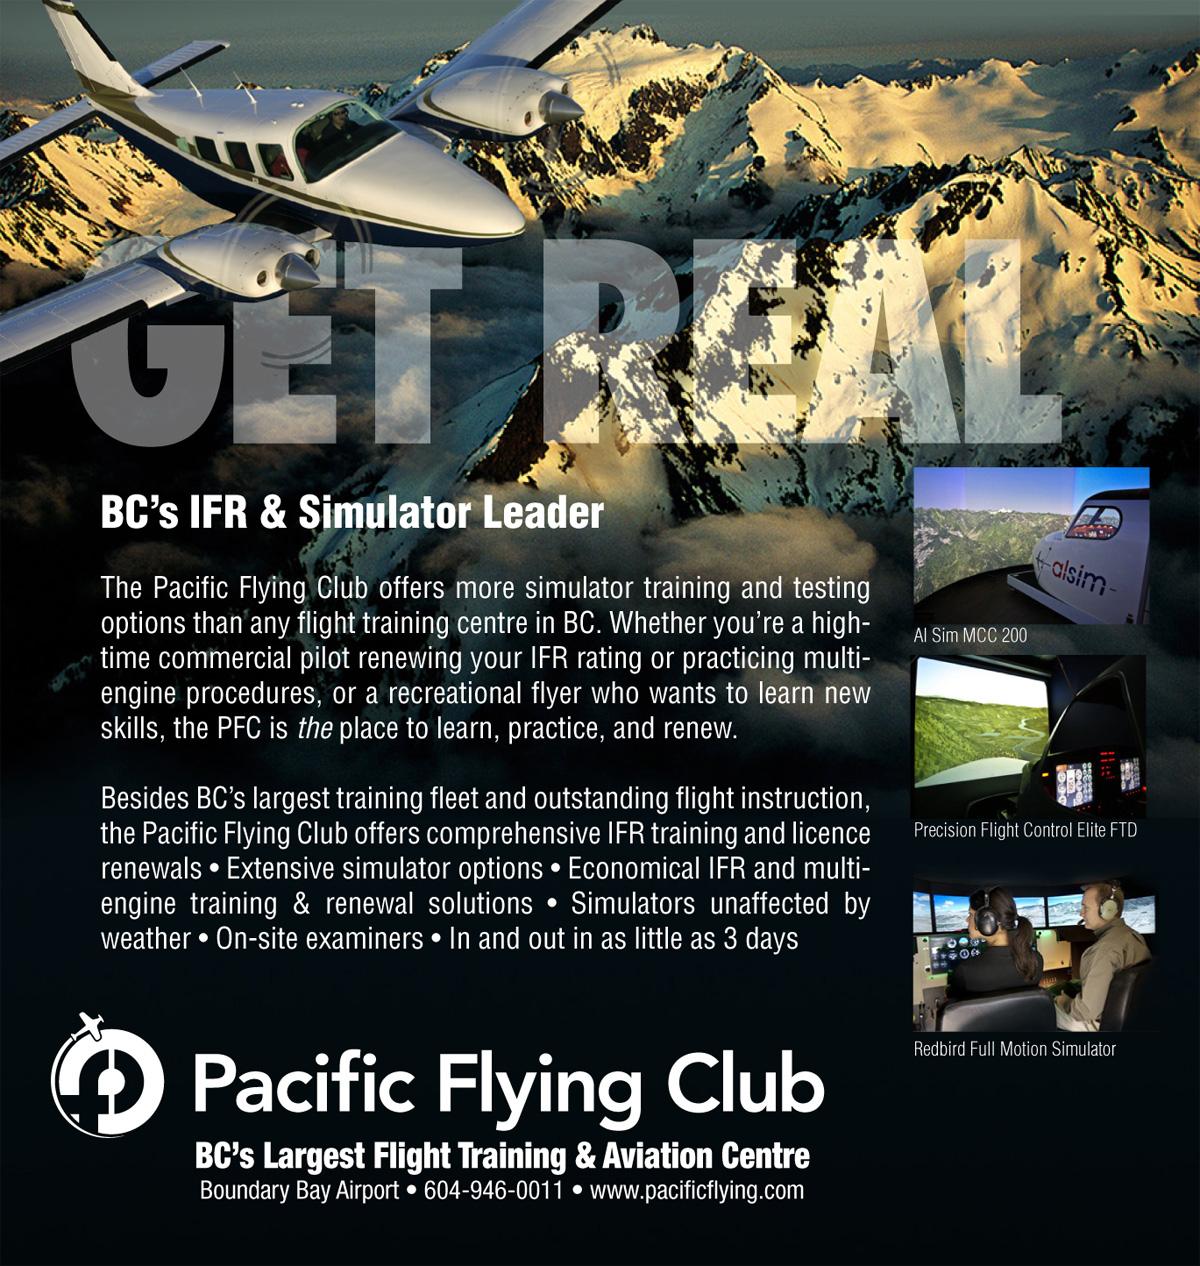 PFC Aviation